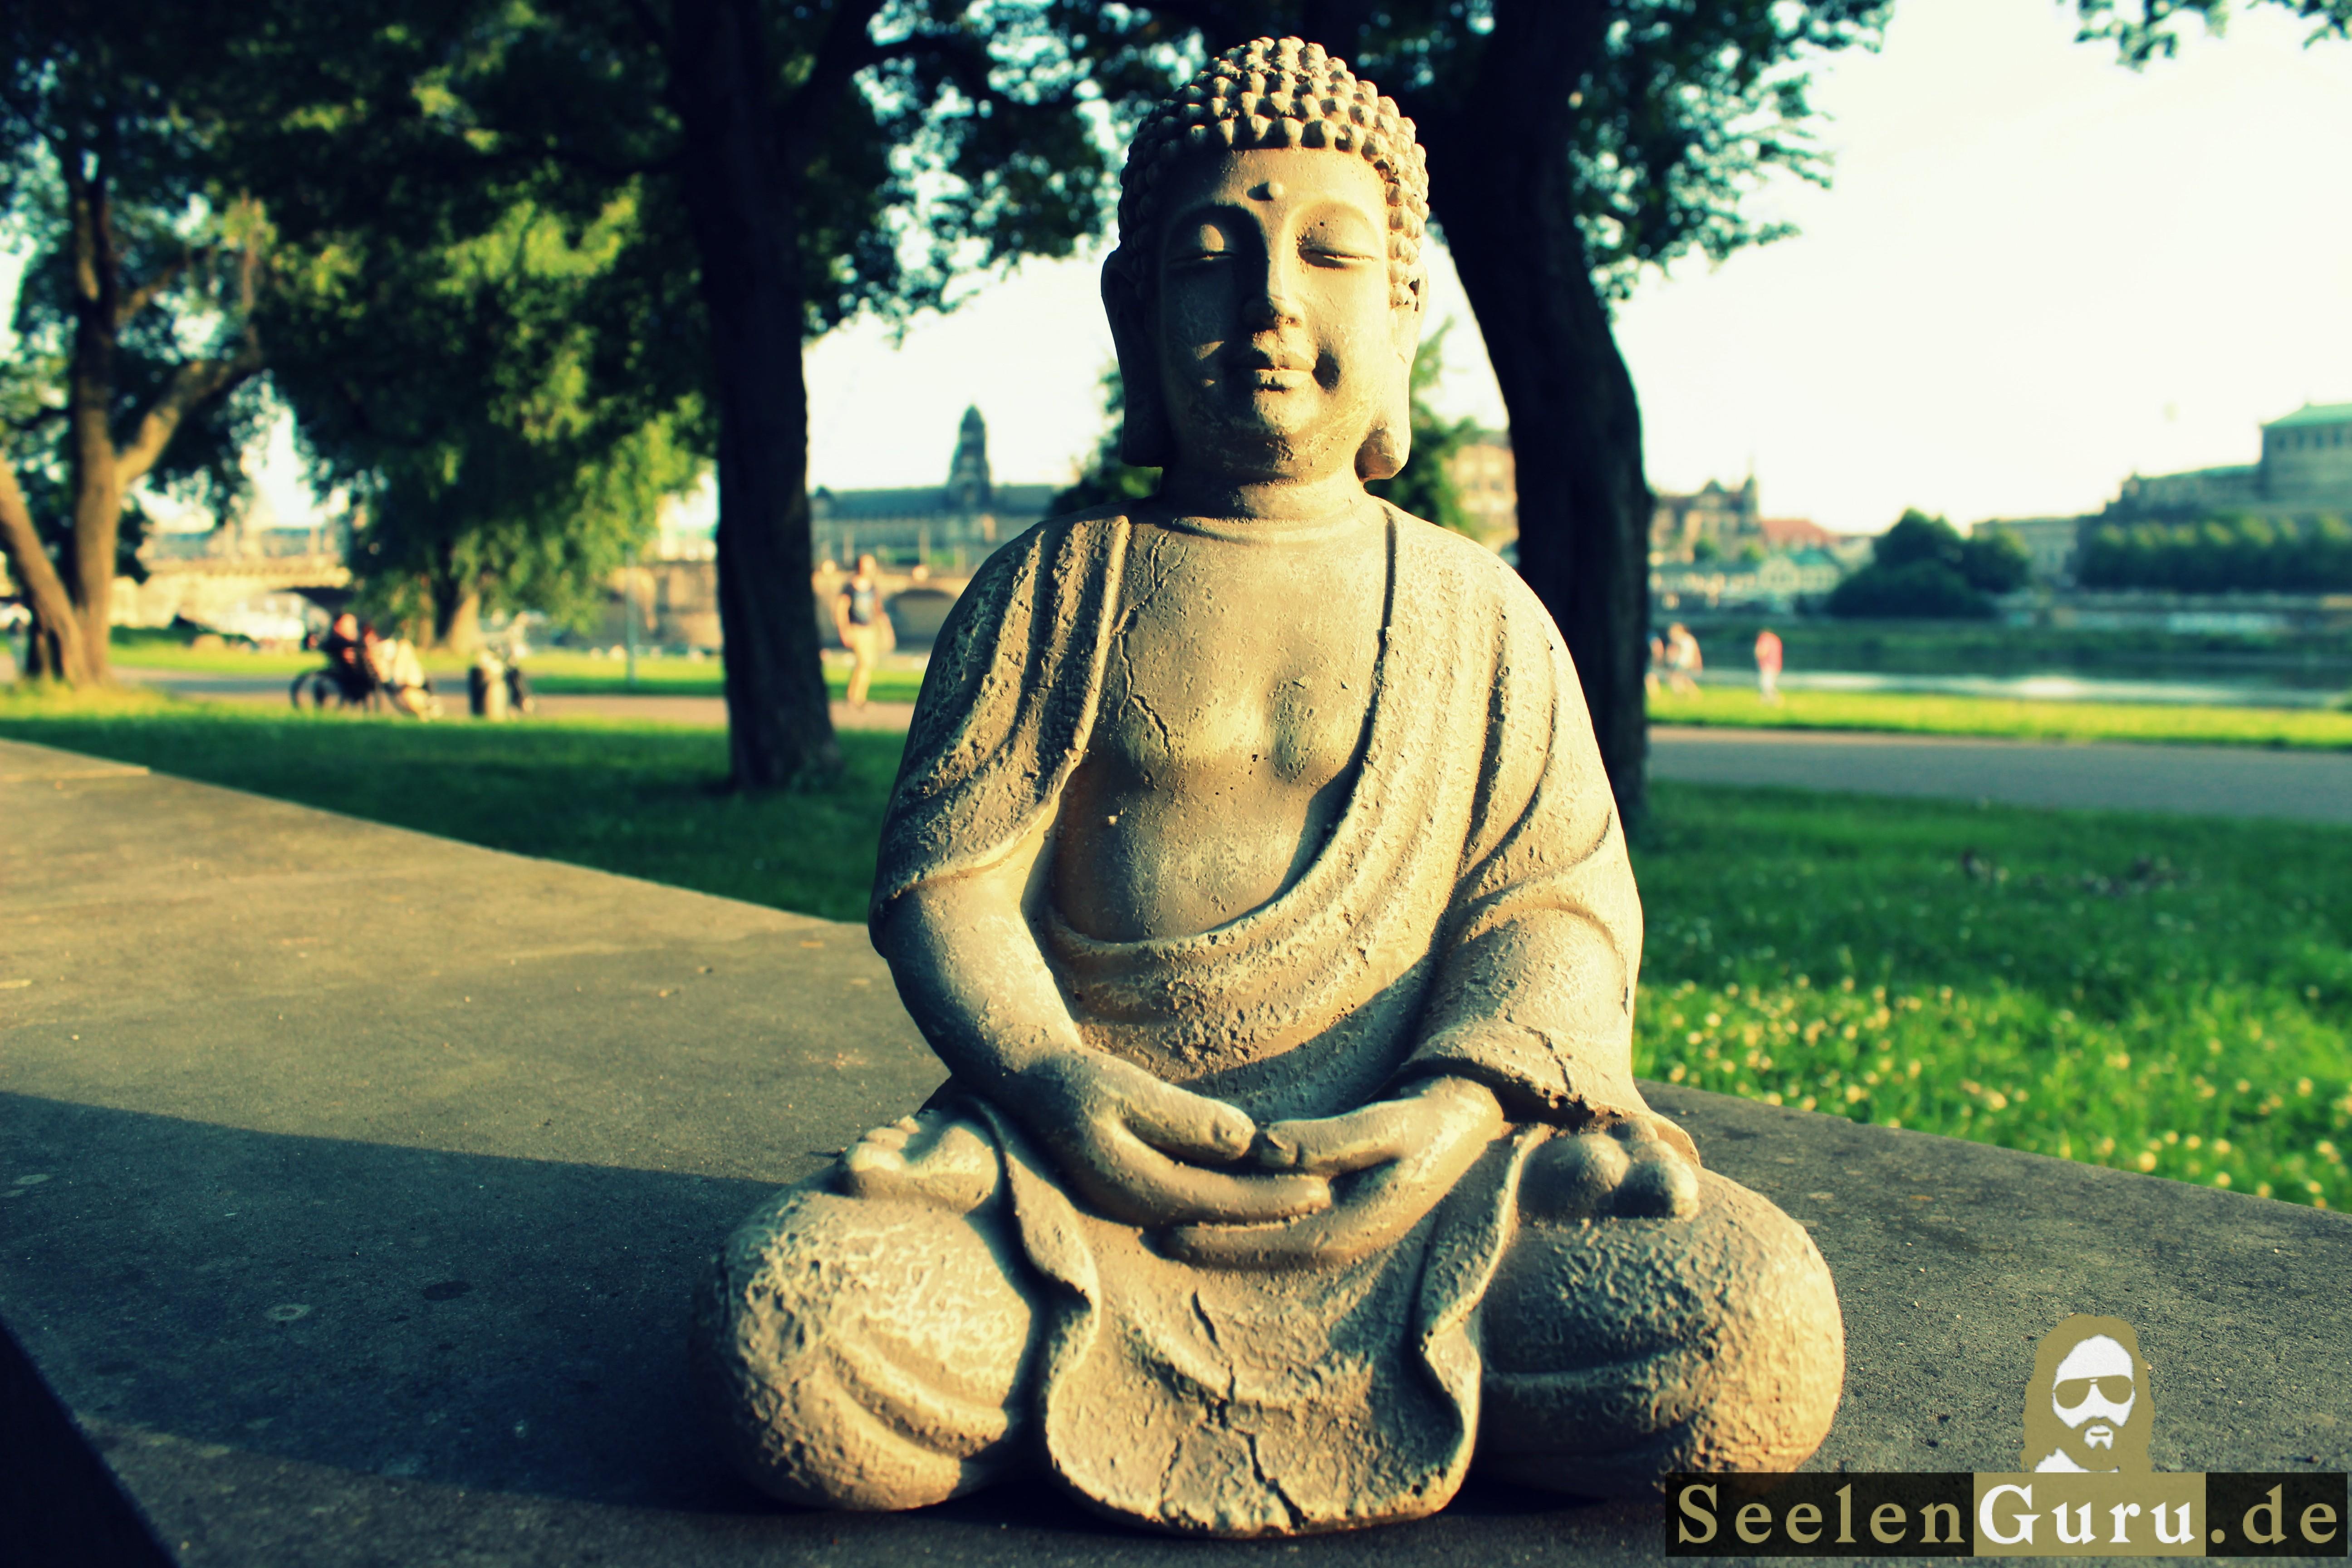 Dresden: Buddha beim meditieren an der Elbe